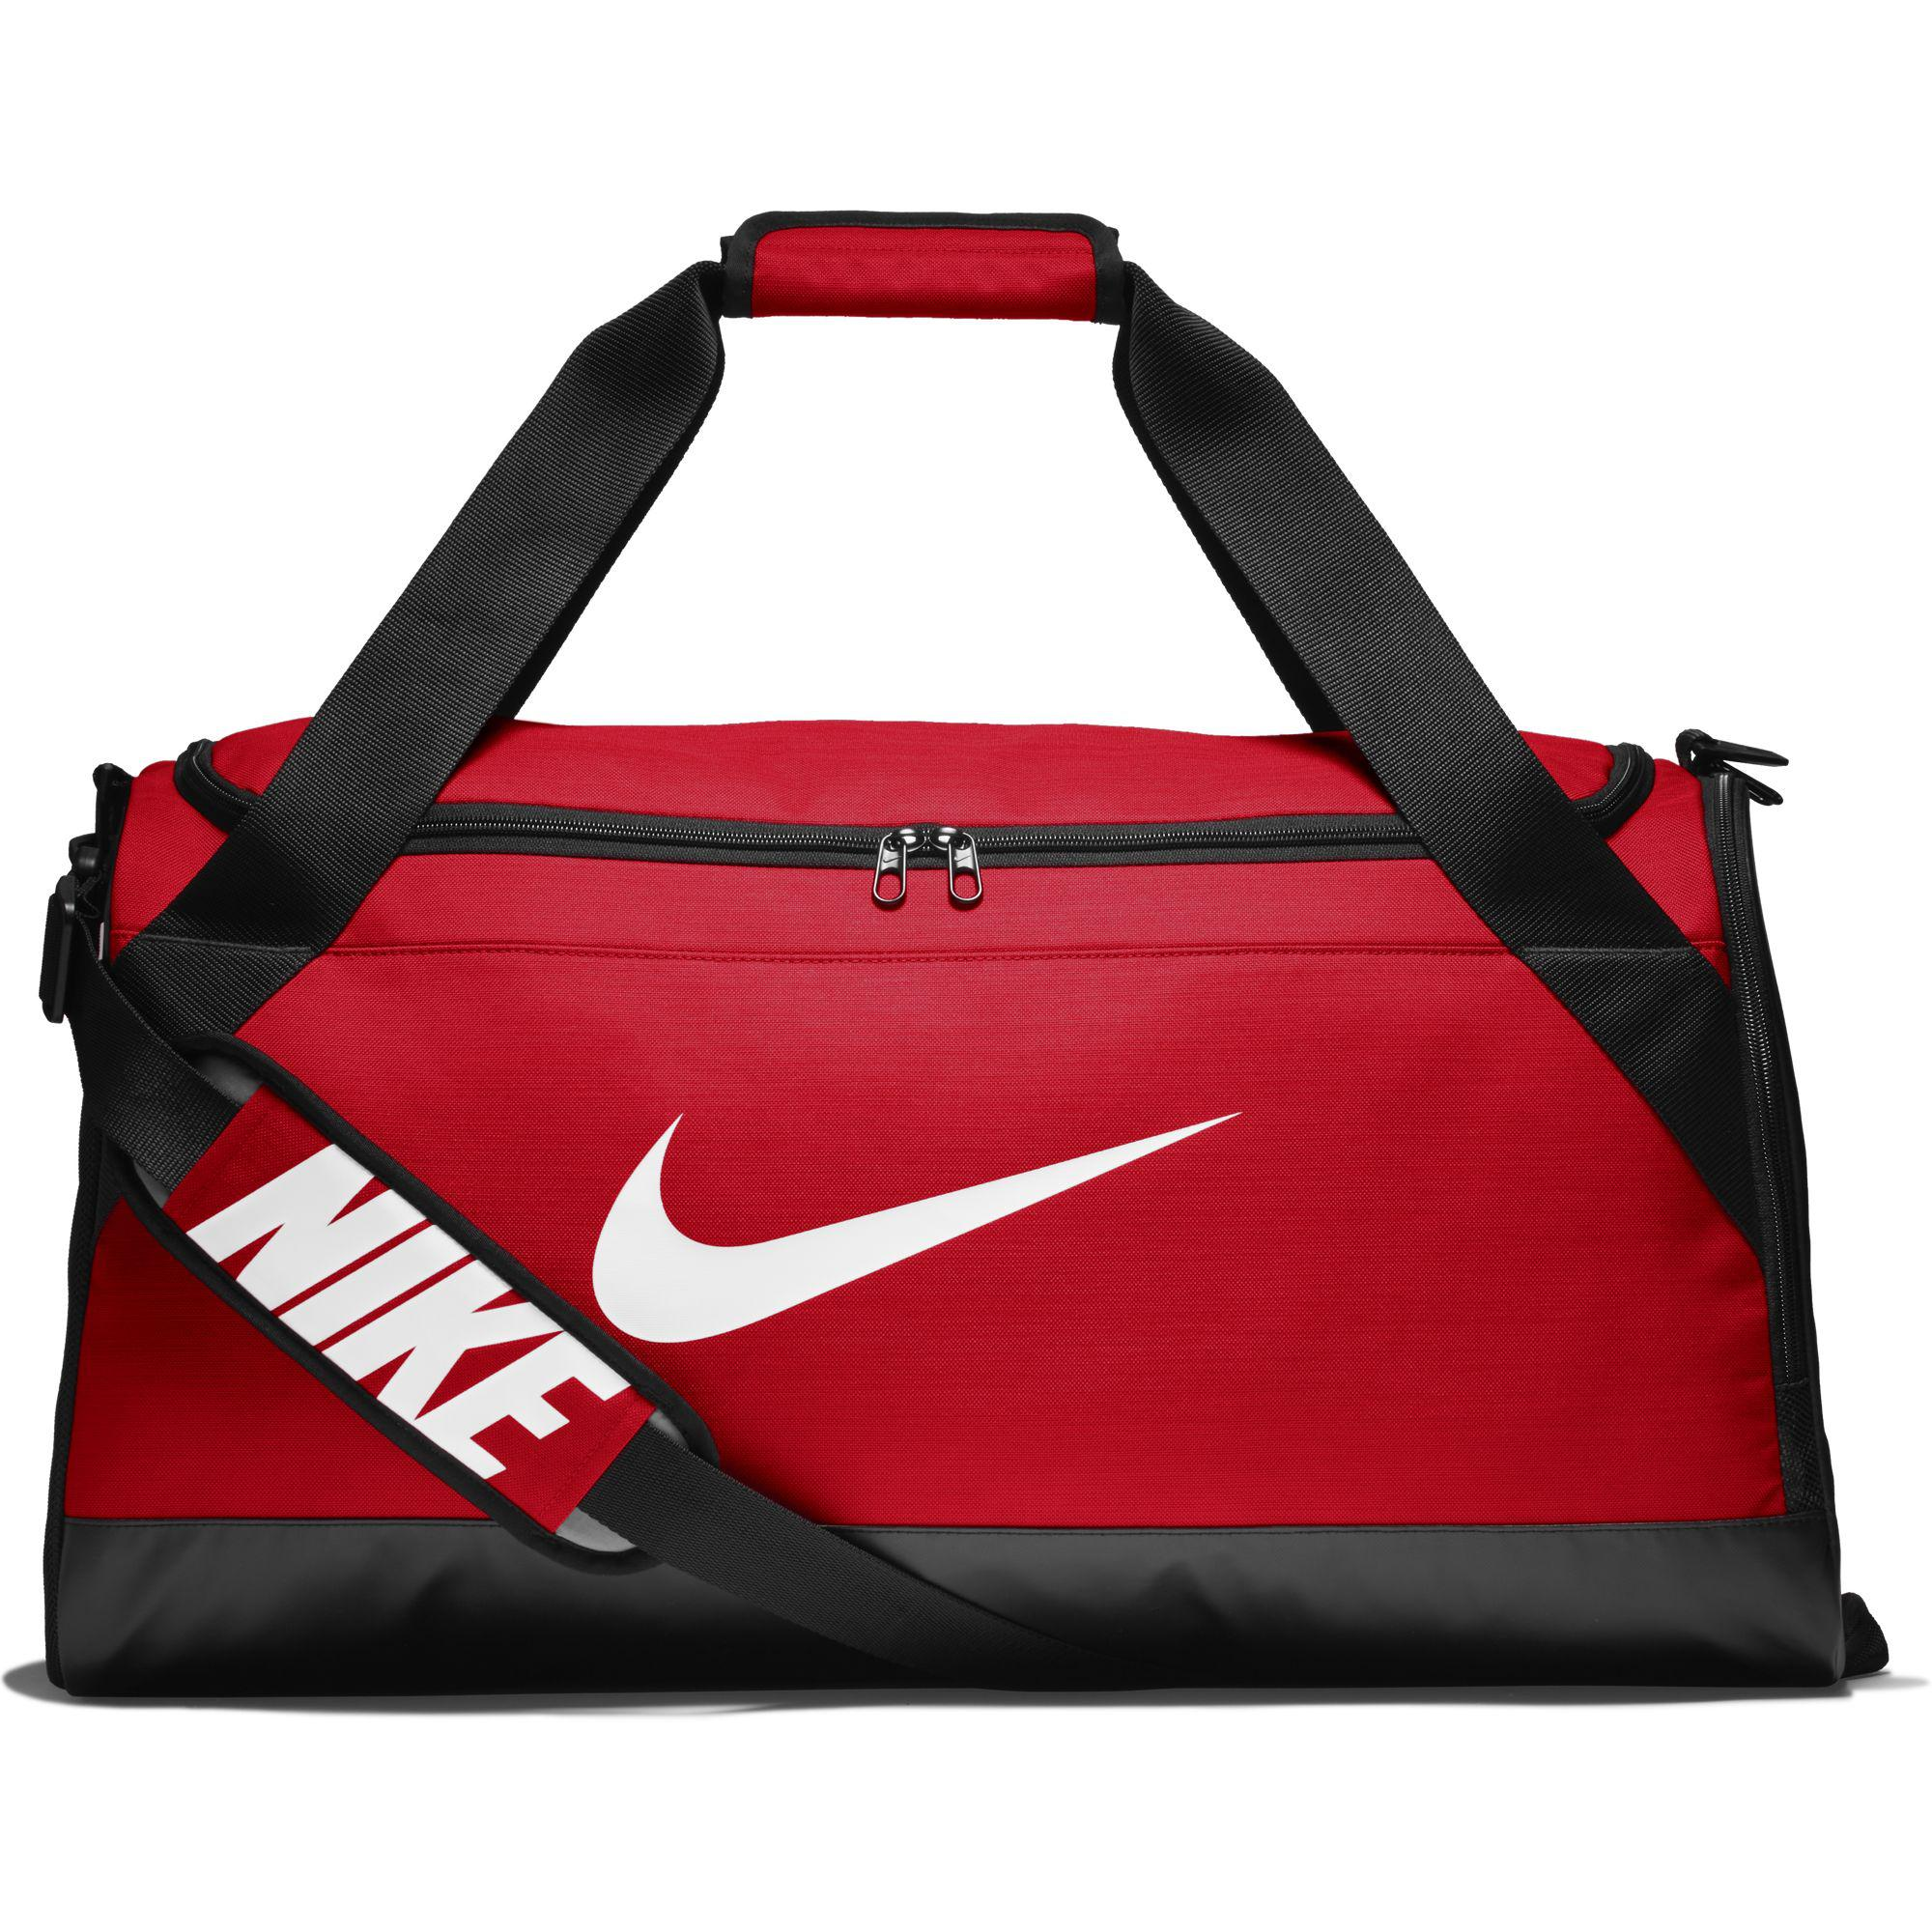 bab46c754a Nike Brasilia Medium Training Duffel Bag - University Red Black White -  Tennisnuts.com